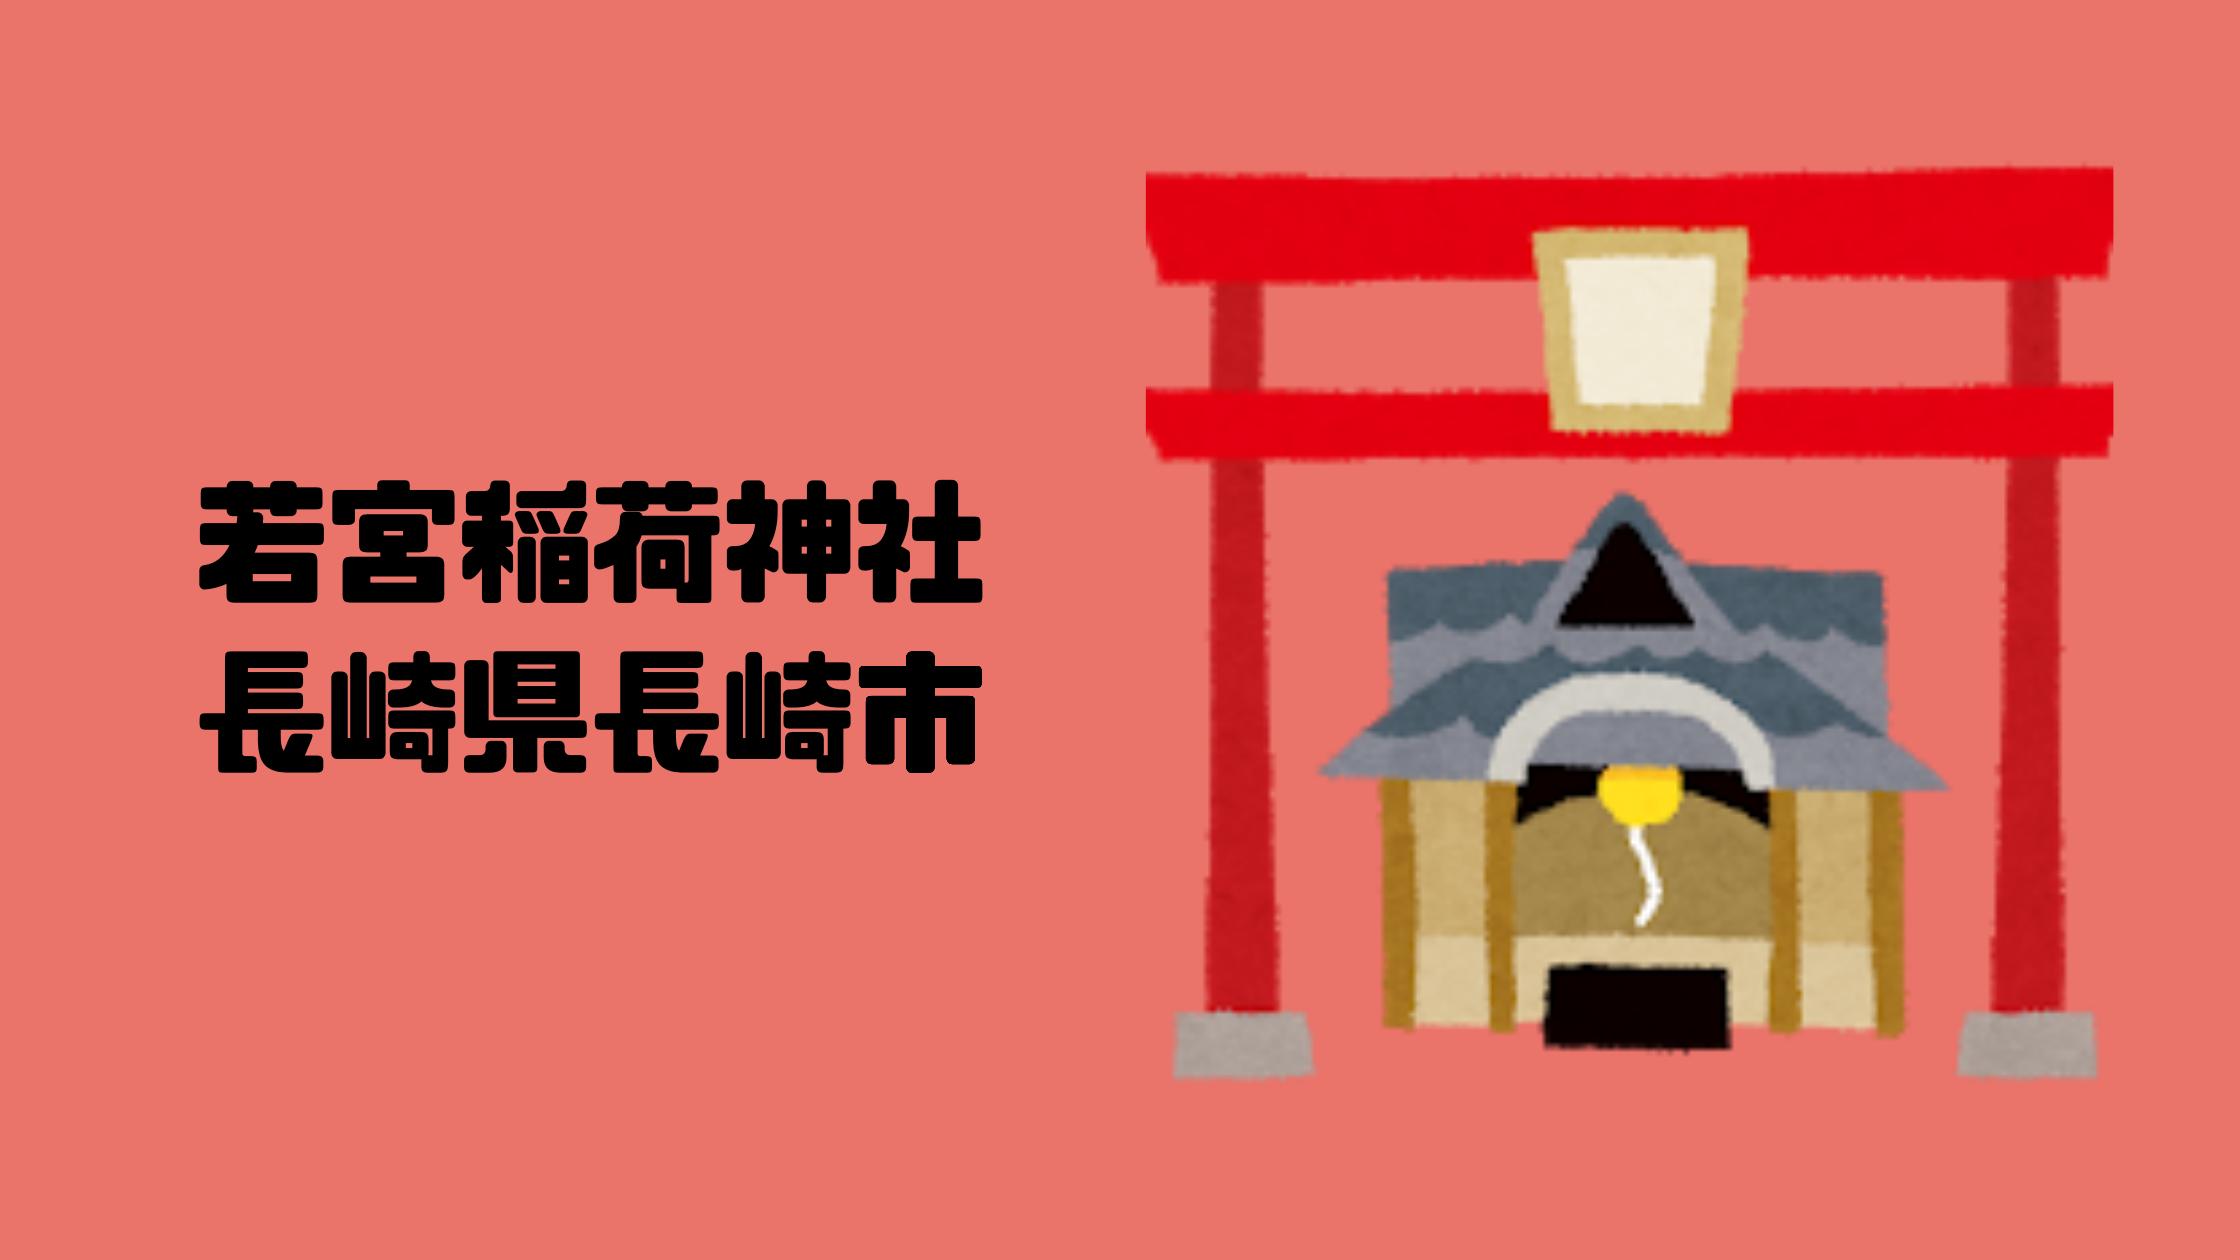 若宮稲荷神社 長崎県長崎市 日本【金運スポット】